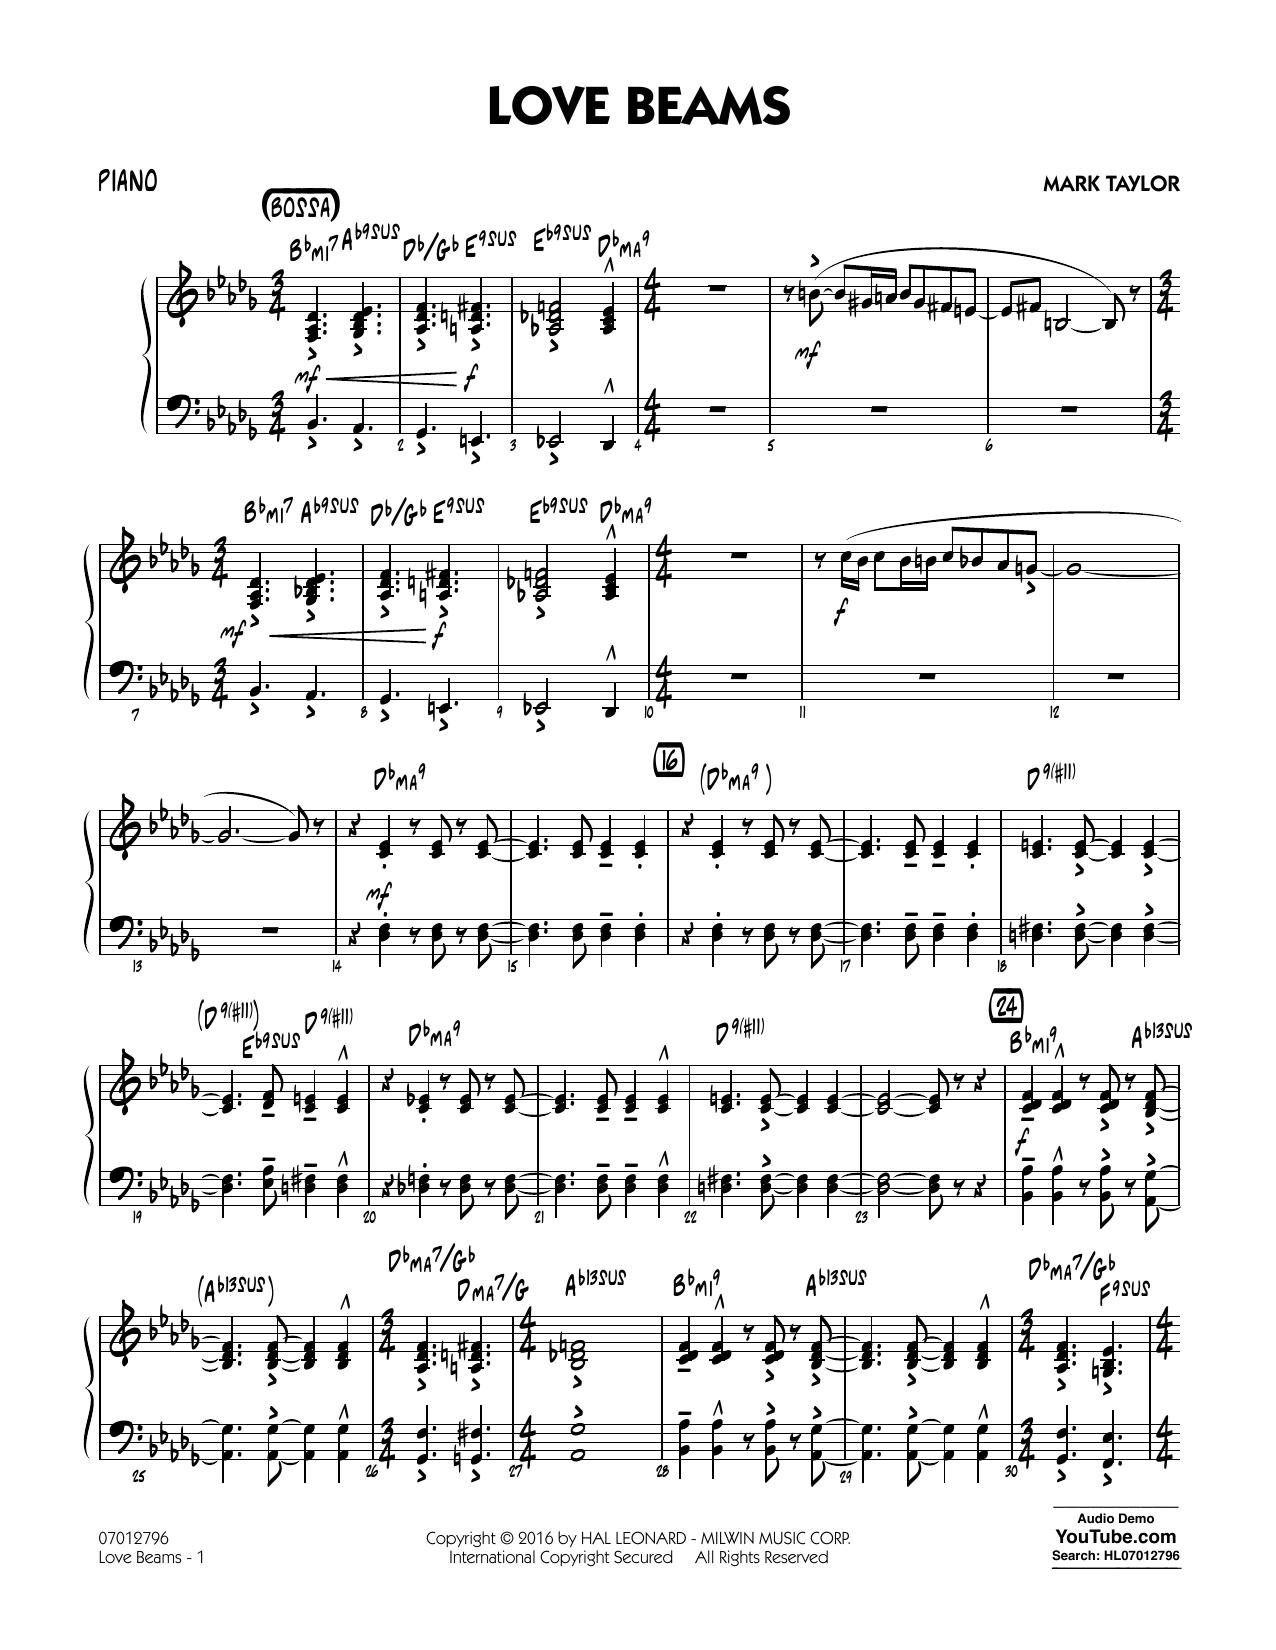 Love Beams - Piano